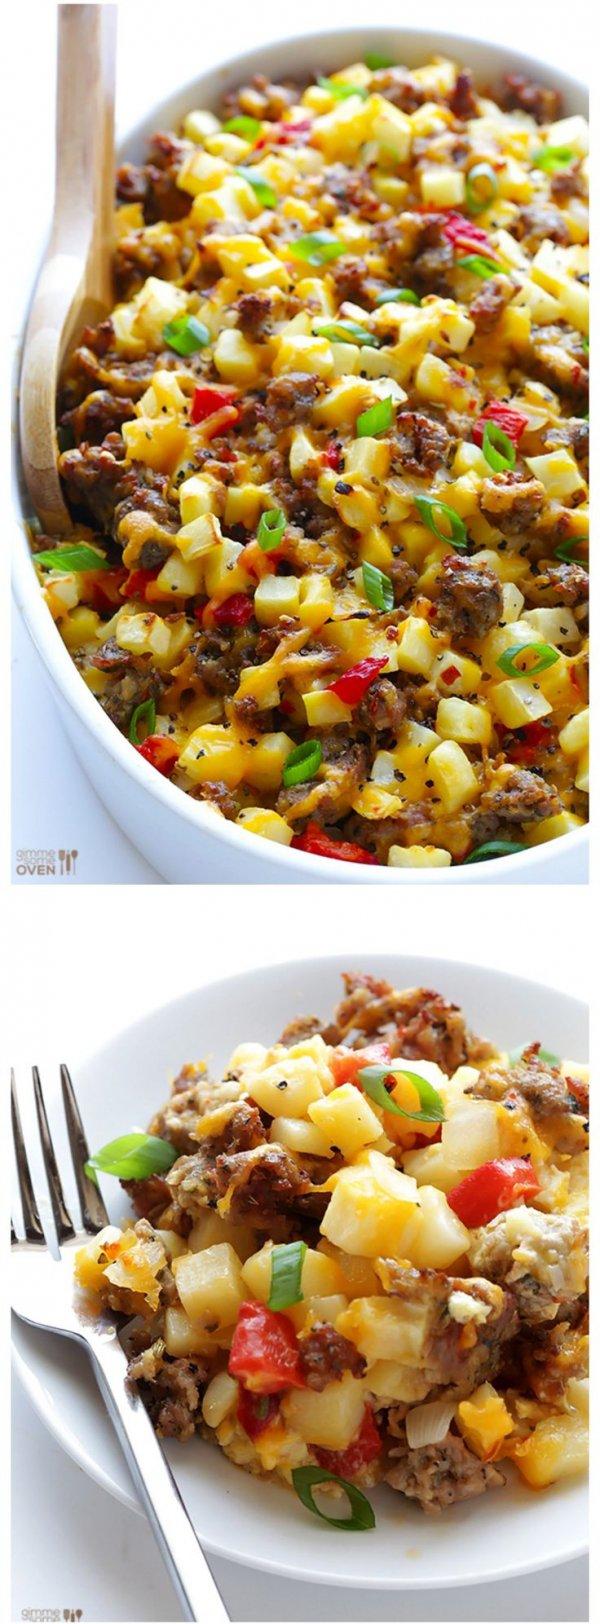 dish,food,cuisine,produce,meal,